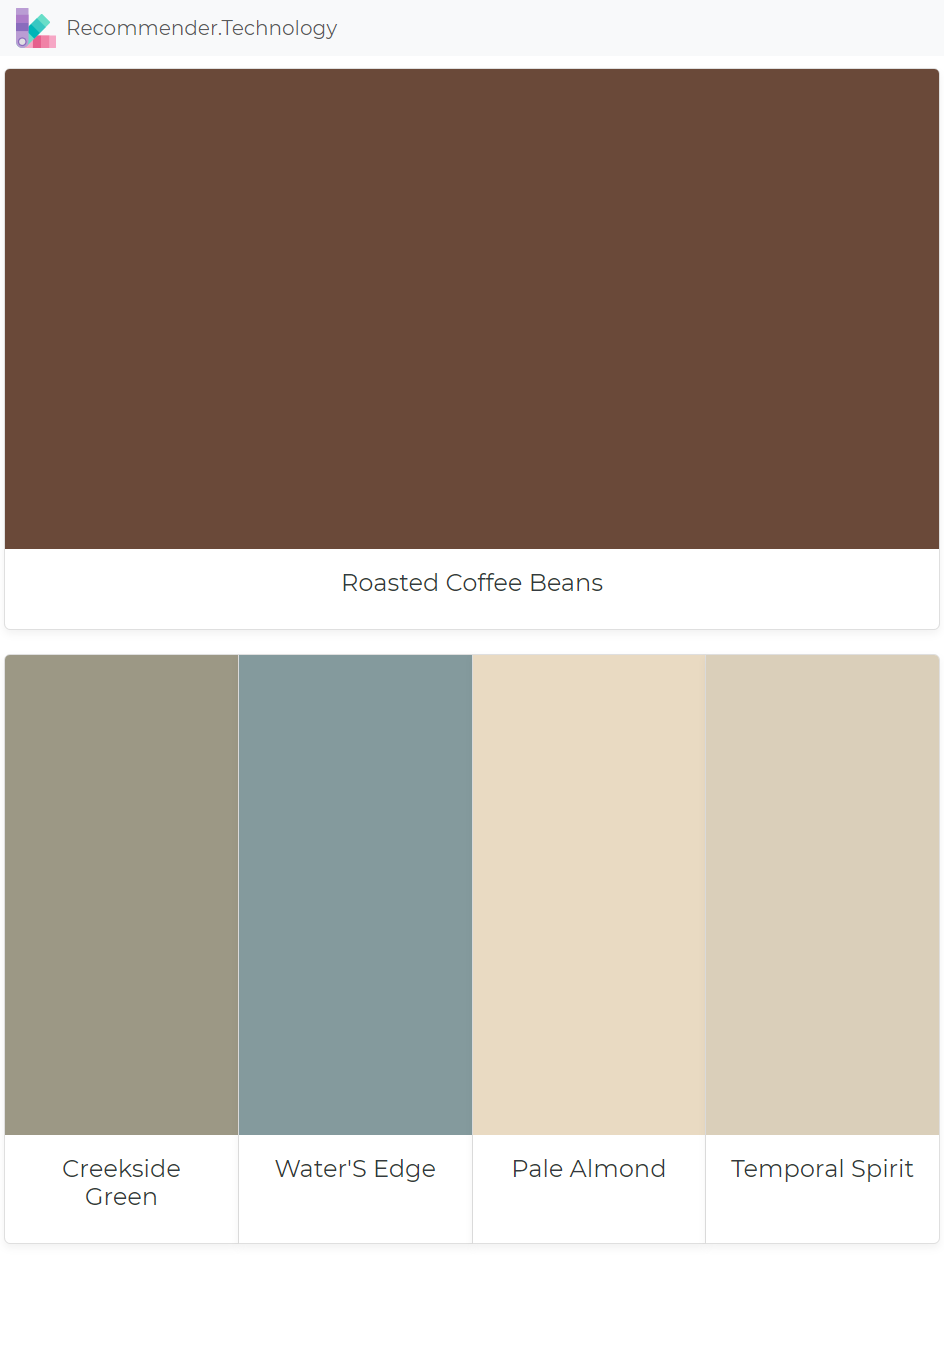 Swell Roasted Coffee Beans Creekside Green Waters Edge Pale Door Handles Collection Olytizonderlifede